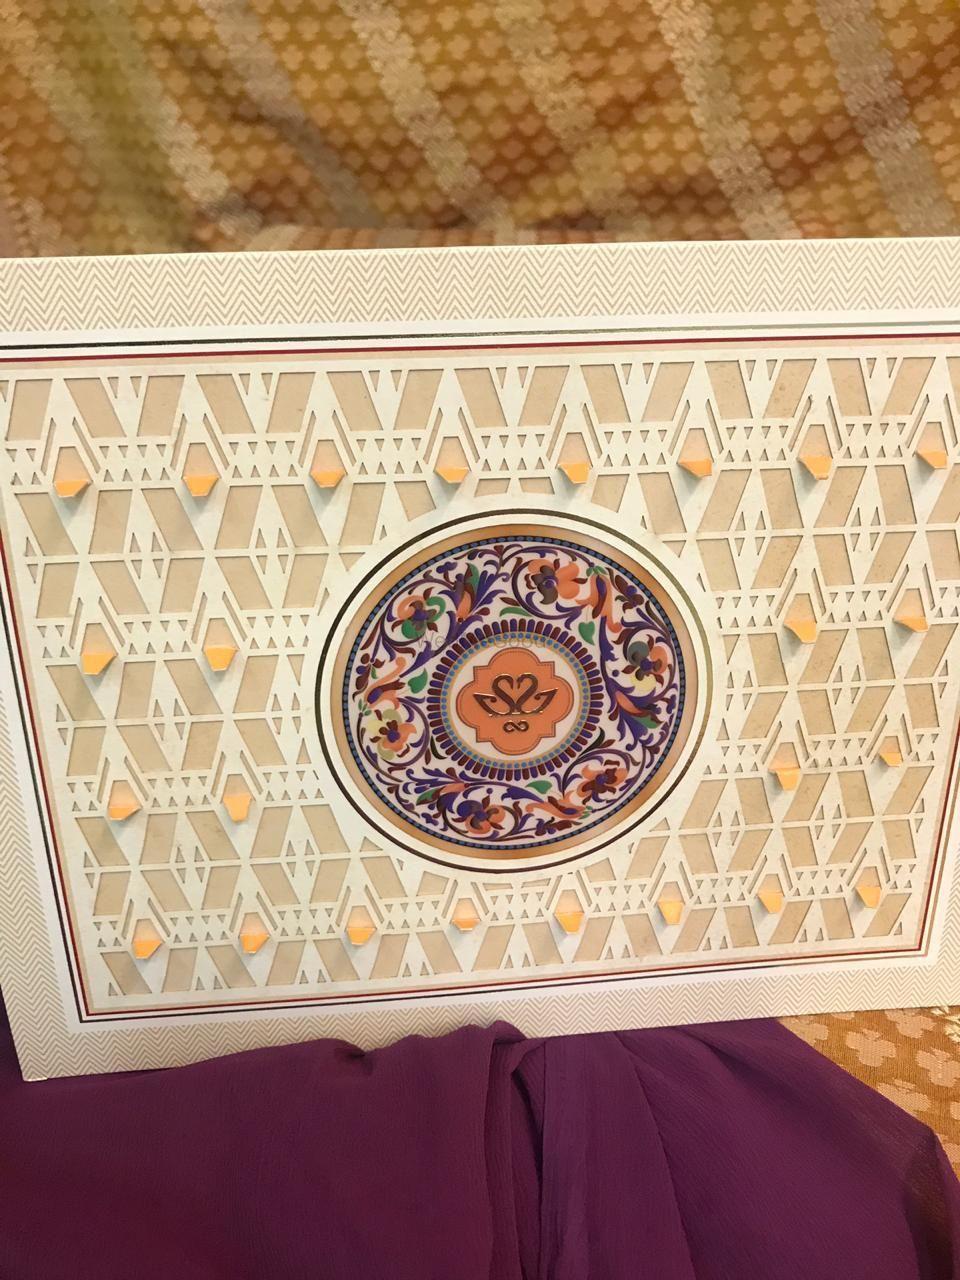 Photo From origami  & Minakari concept box wedding card  (Shanay weds Jinal) - By Krimson Design